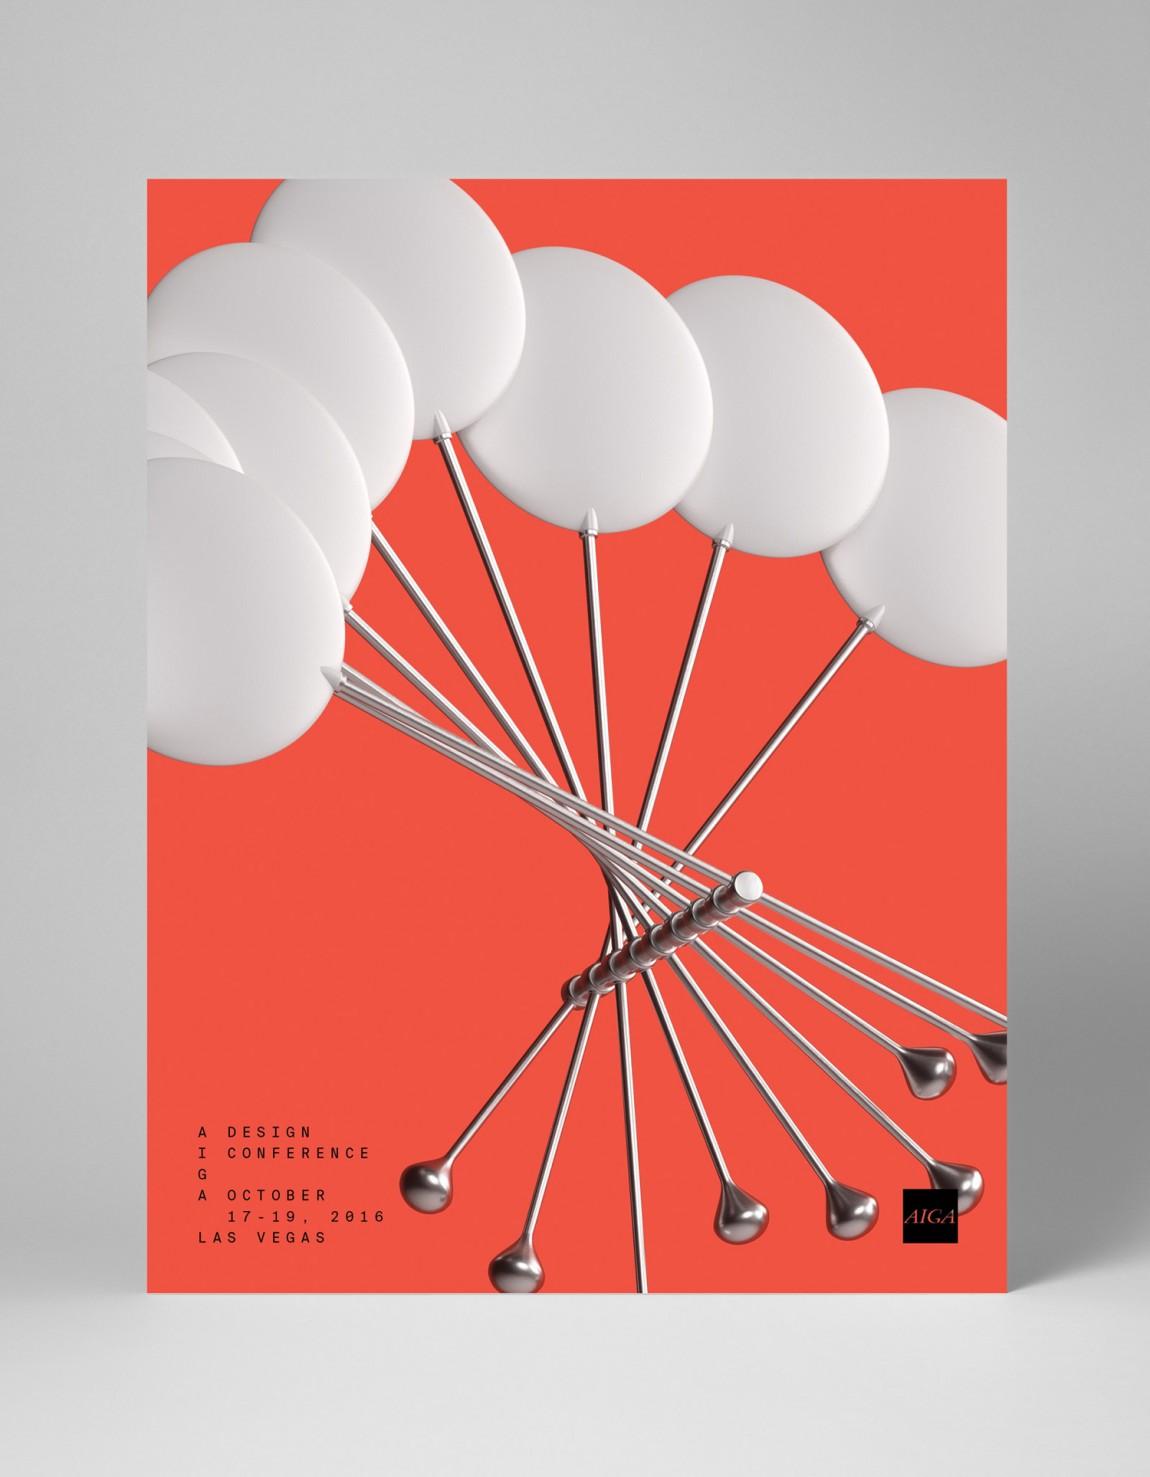 AIGA品牌形象策划和vi形象设计, 户外广告设计